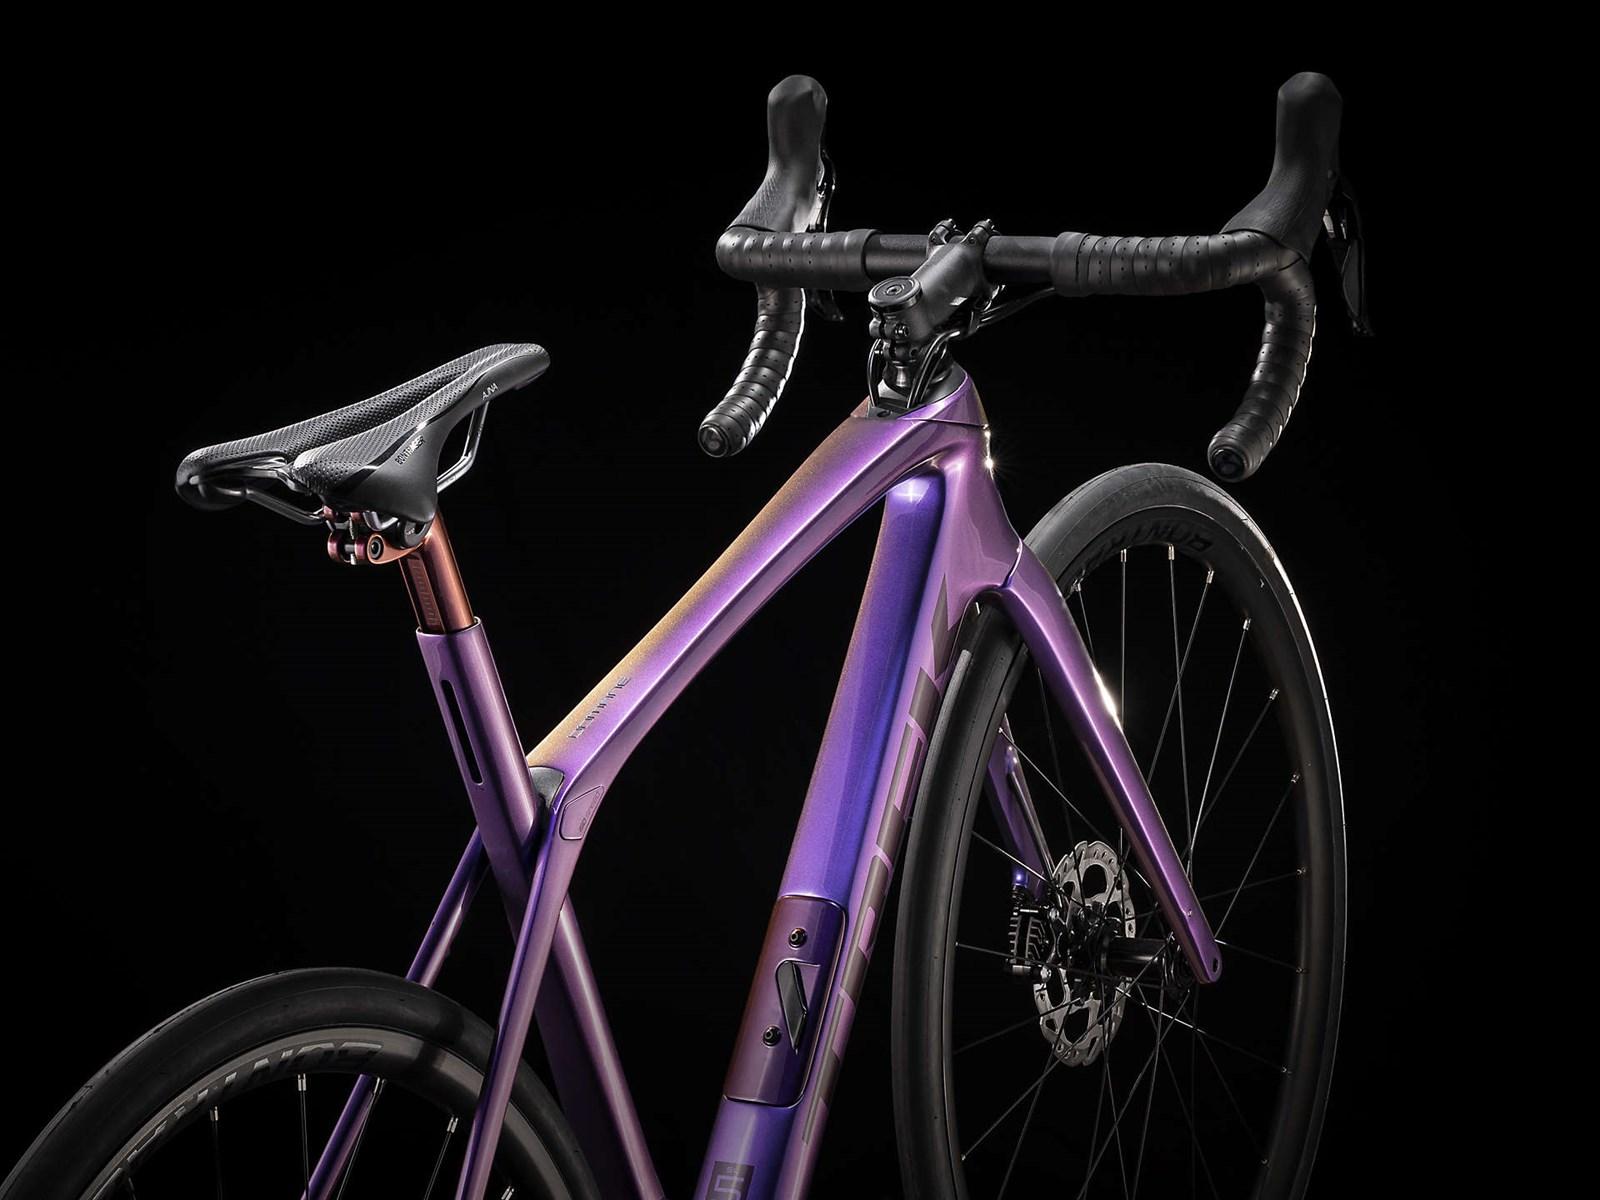 Trek Domane SL 5 Disc Road Bike 2020 - Purple